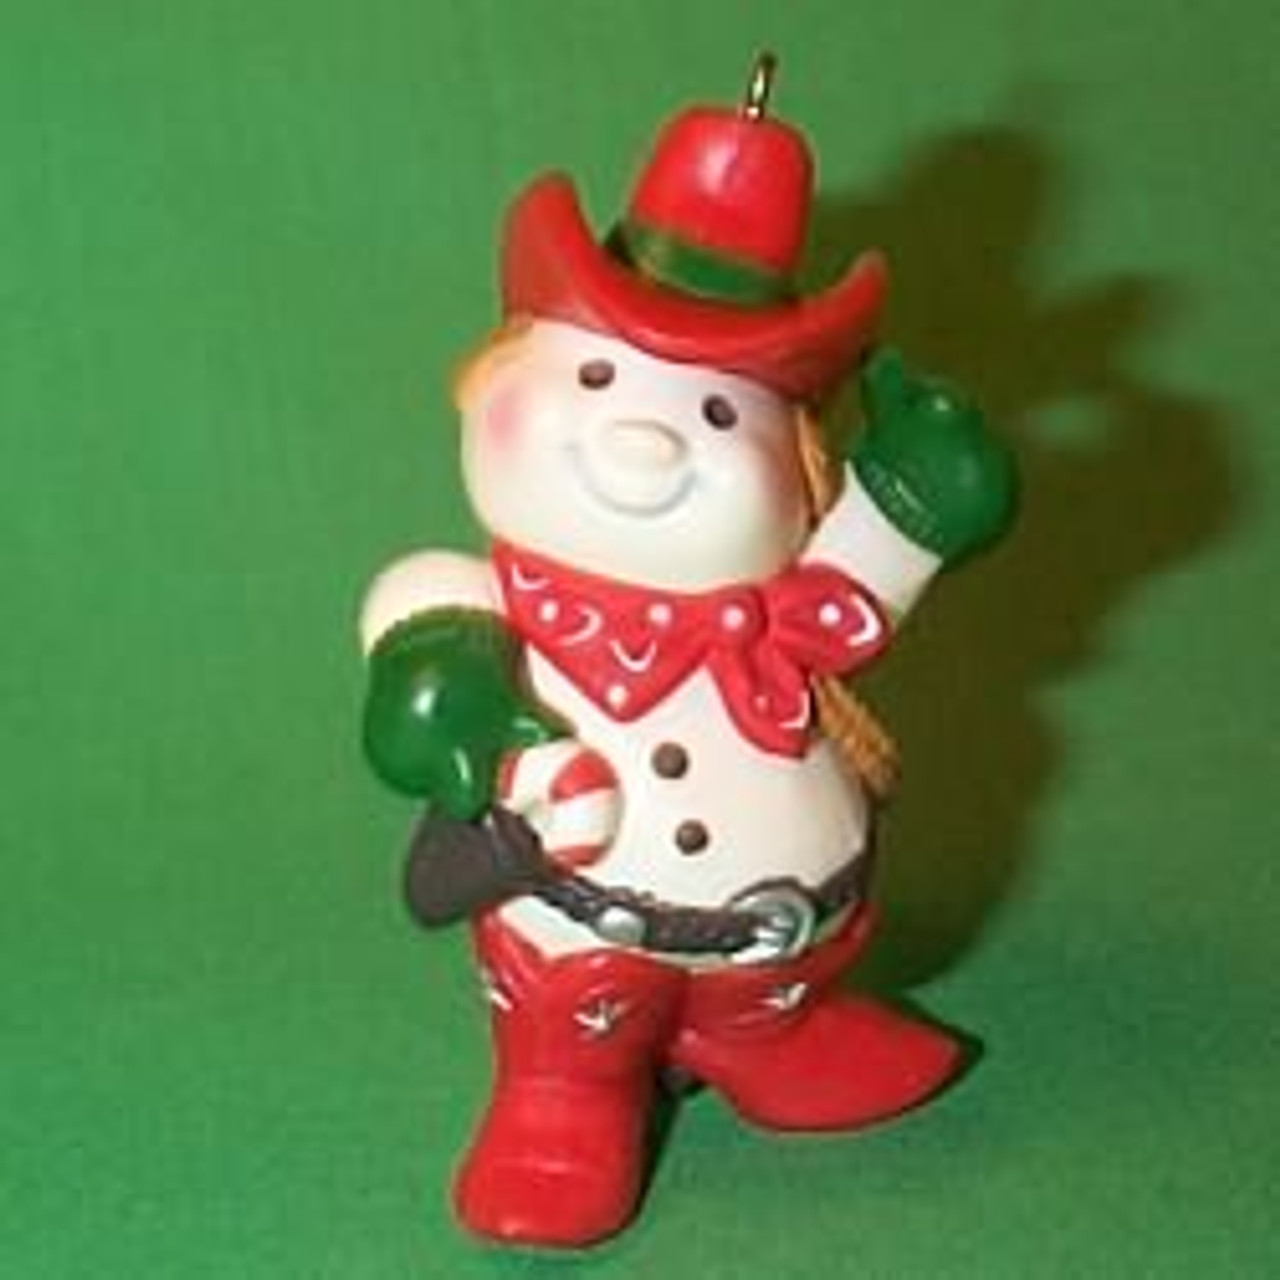 New Hallmark Ornament Cowboy Snowman 1982 QX4806